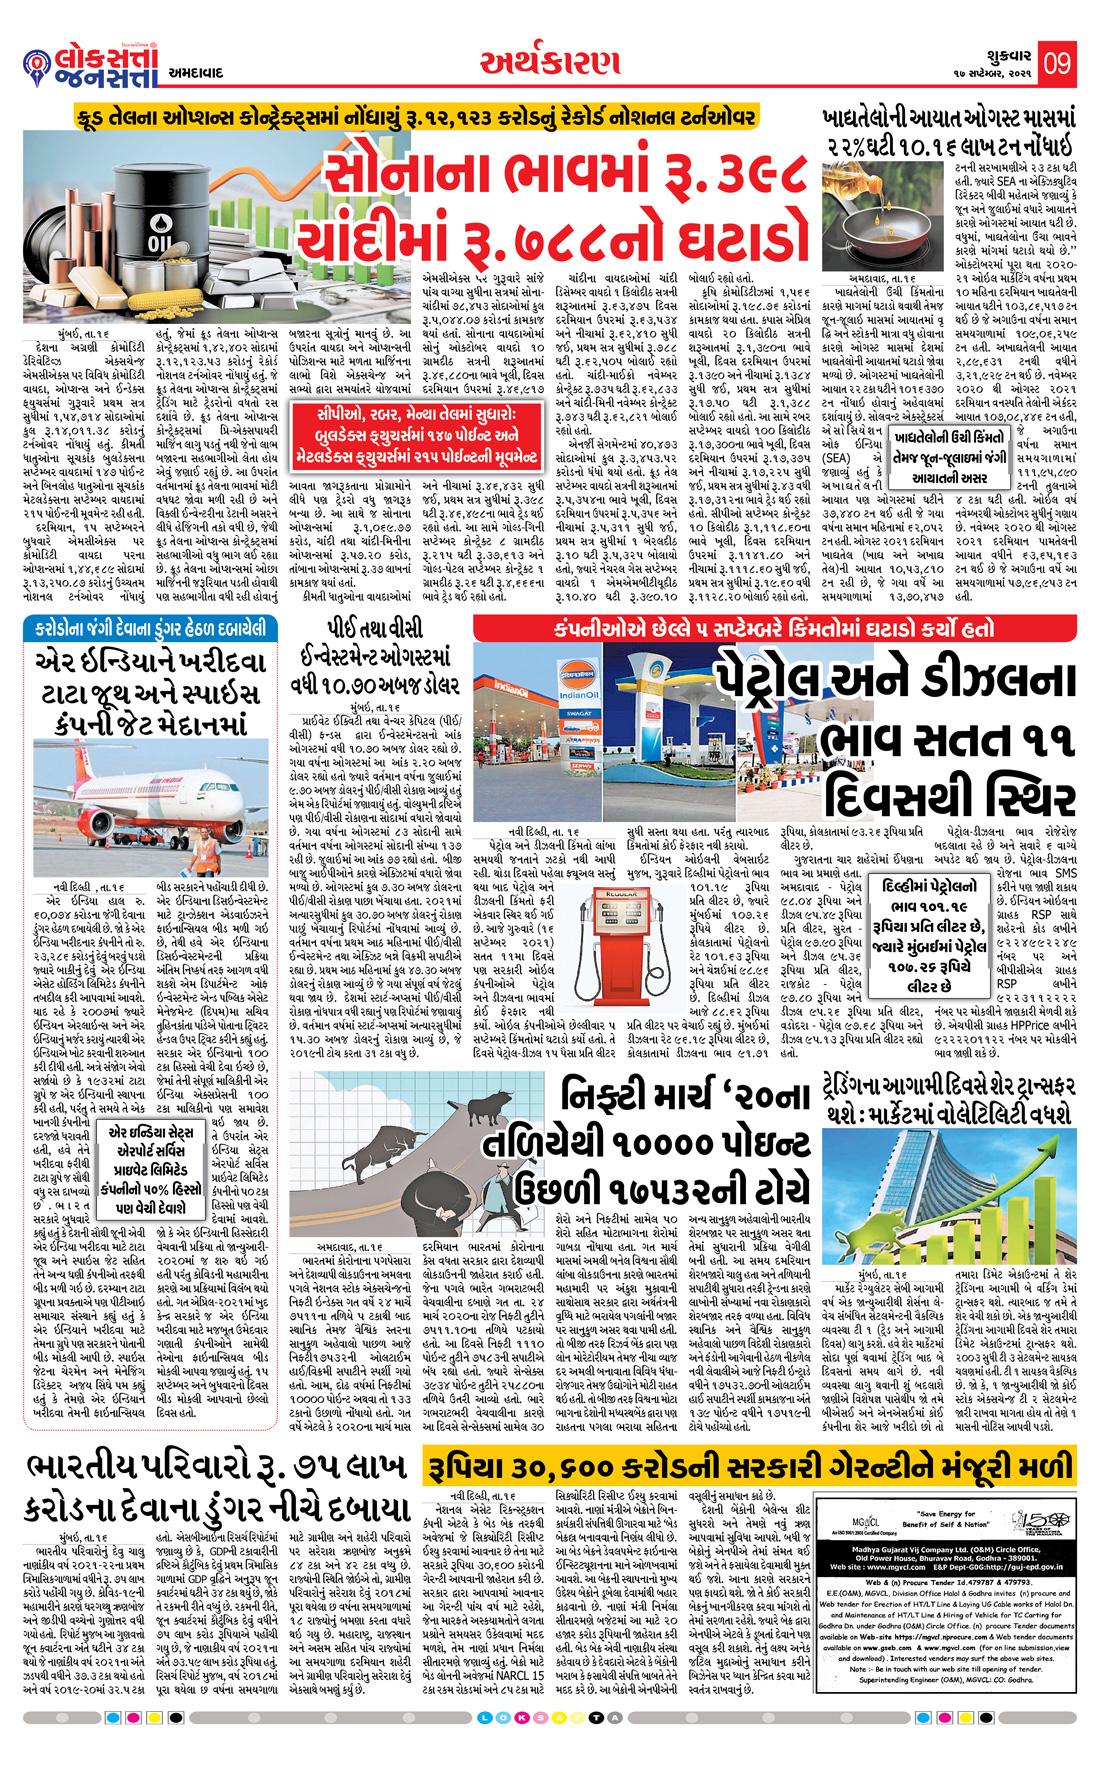 Loksatta Jansatta News Papaer E-paper dated 2021-09-17   Page 9